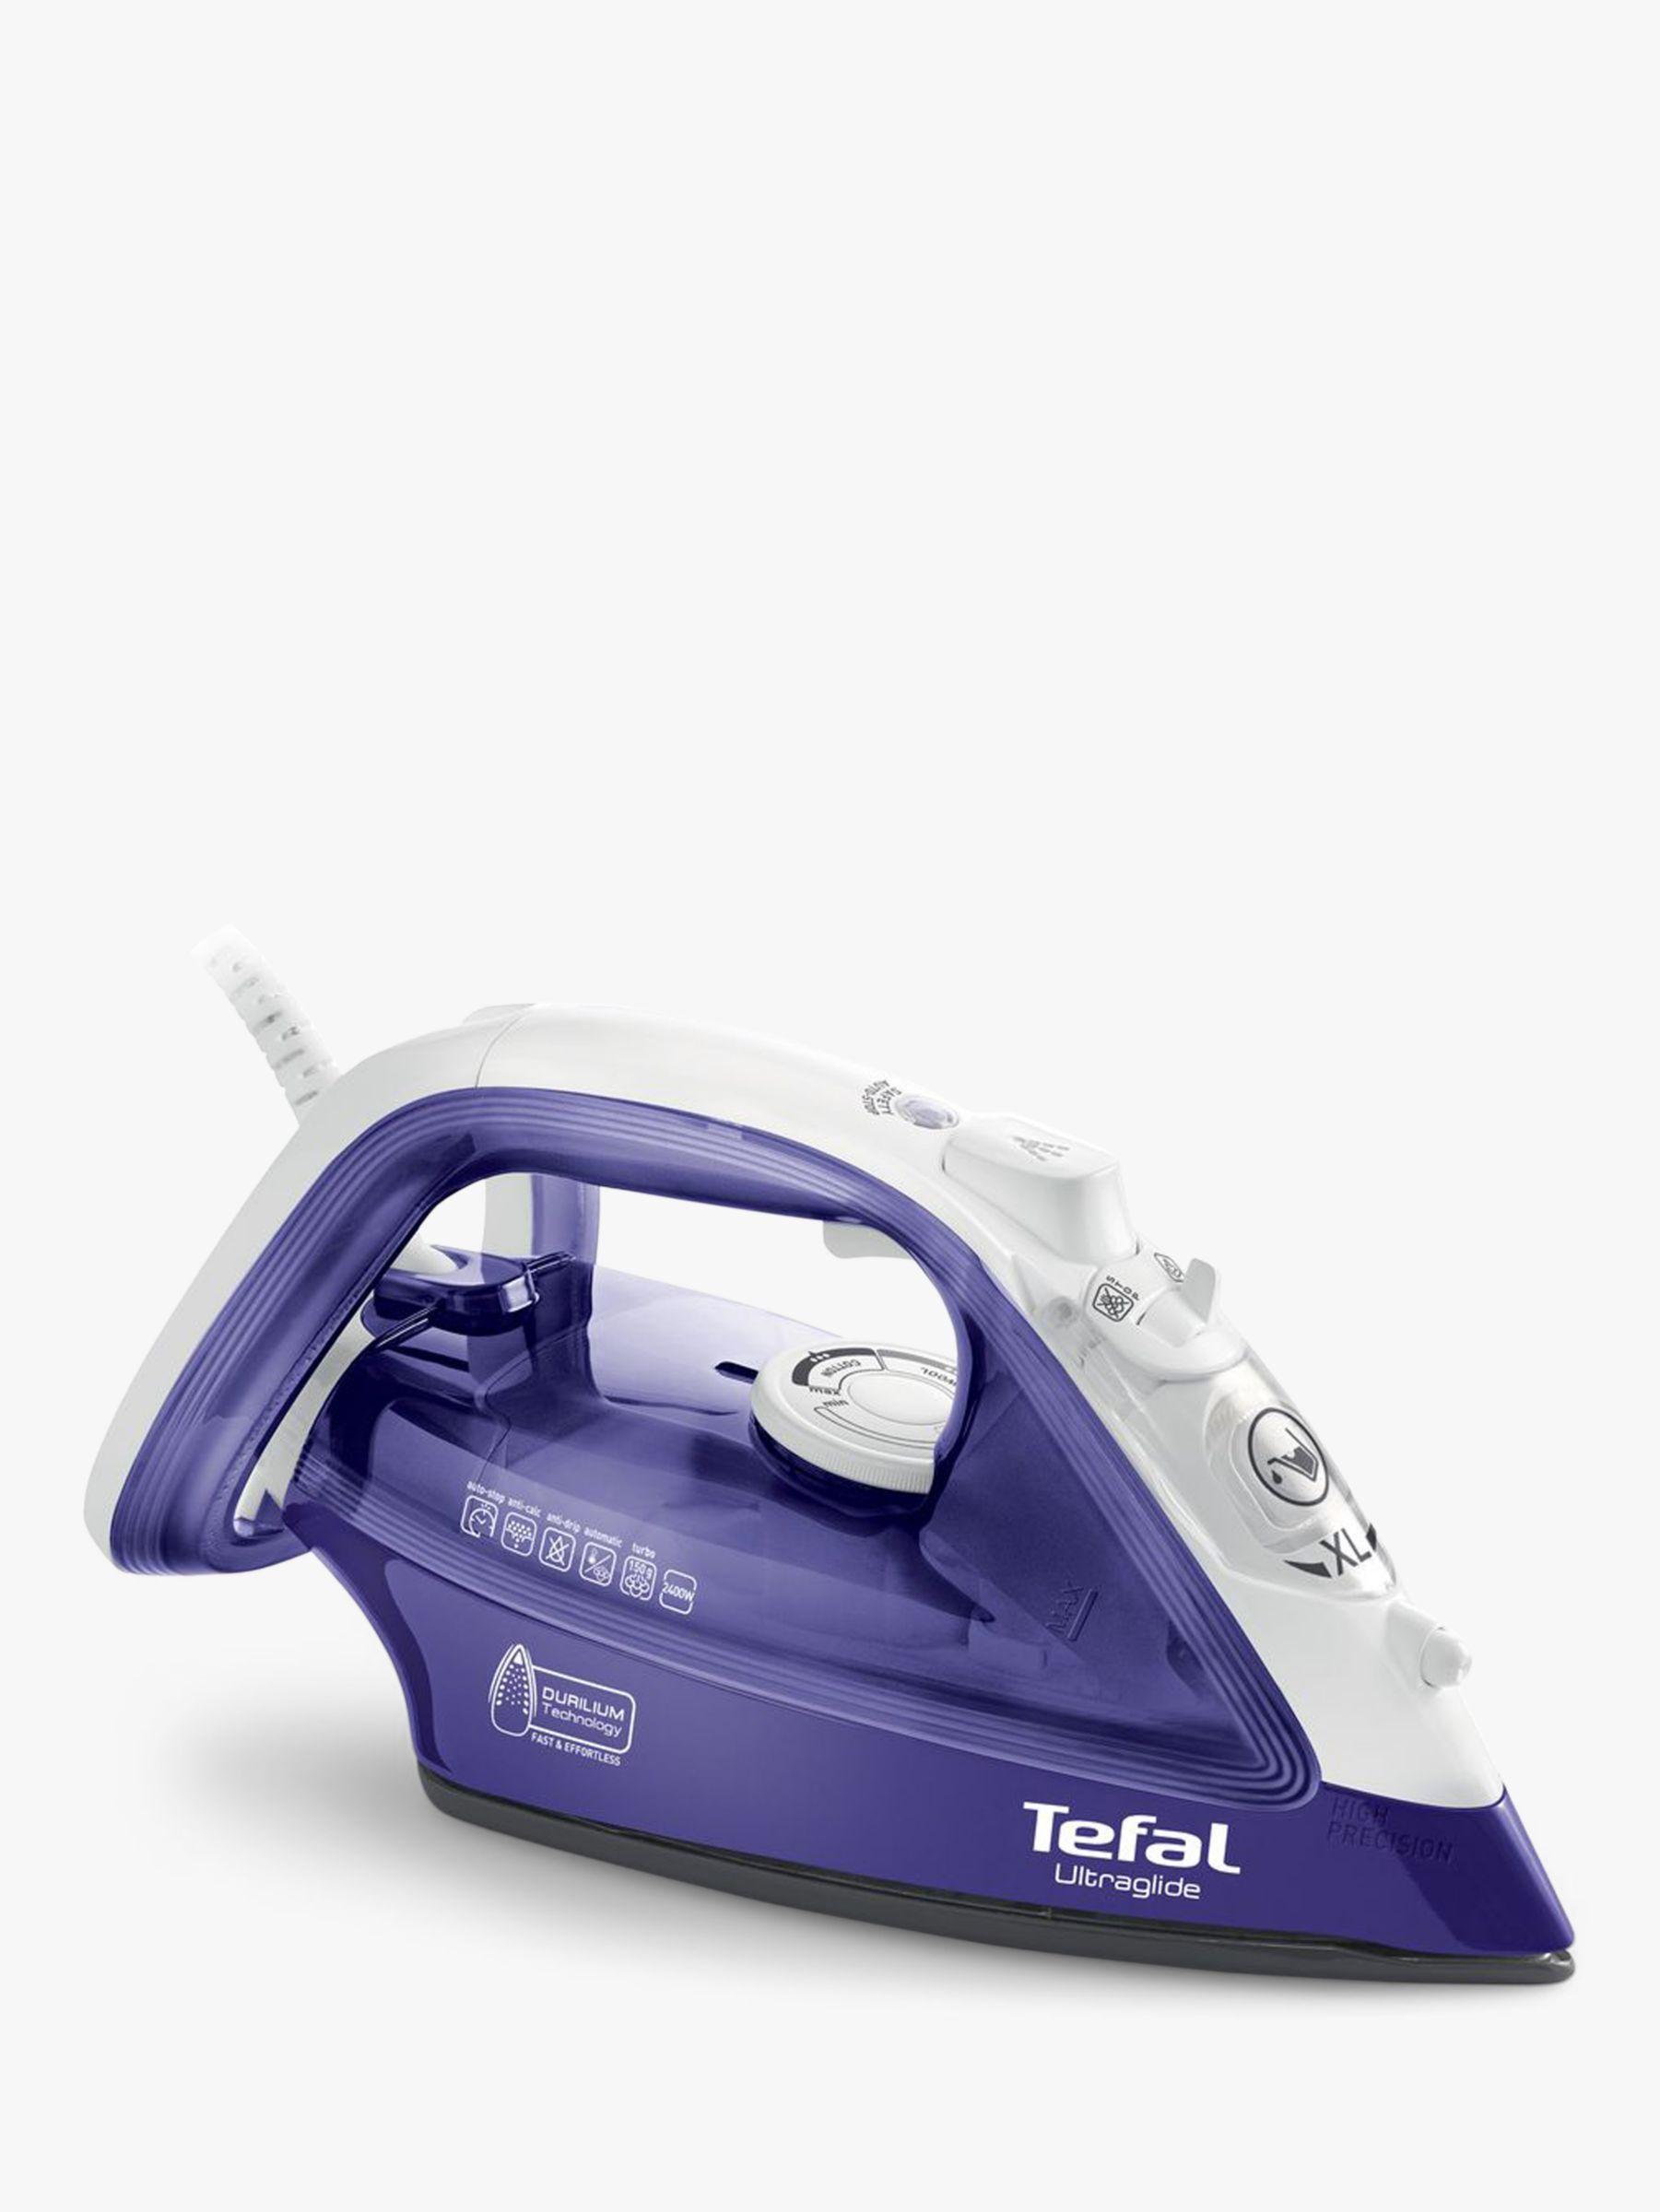 Tefal Tefal Ultraglide FV4092G0 Steam Iron, Indi Grape